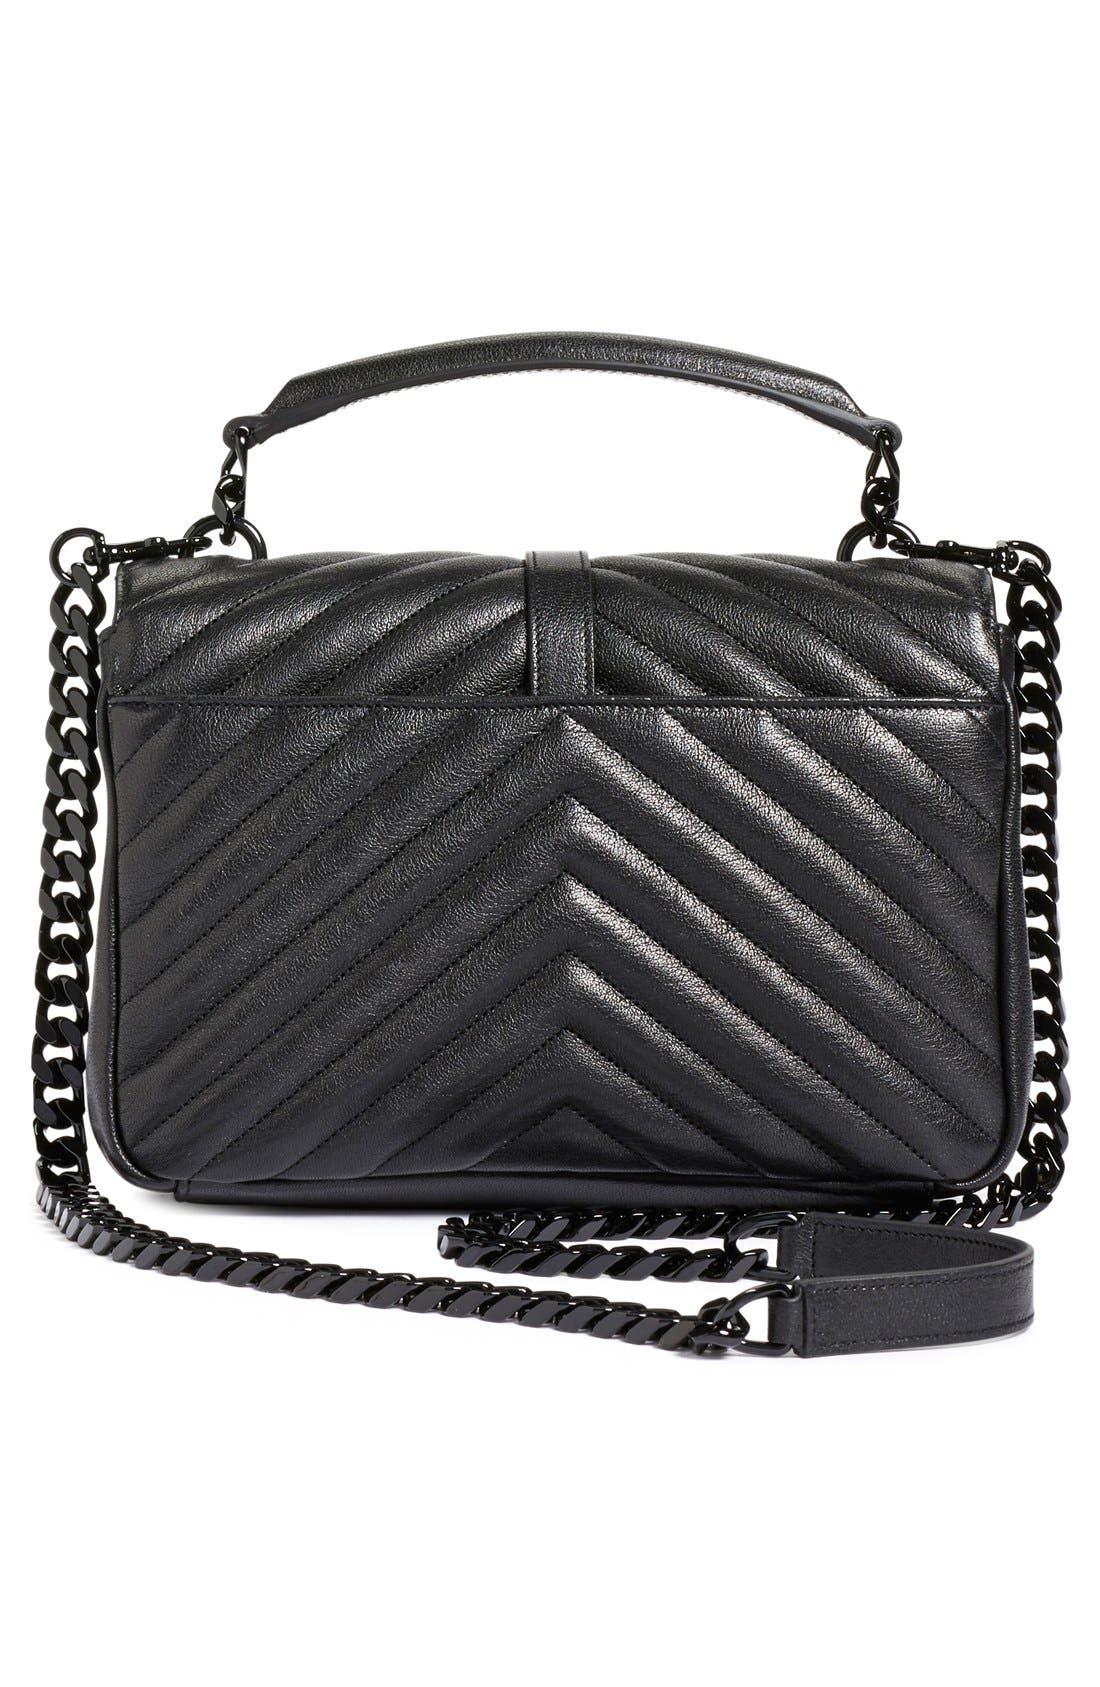 'Medium College' Quilted Leather Shoulder Bag,                             Alternate thumbnail 3, color,                             001